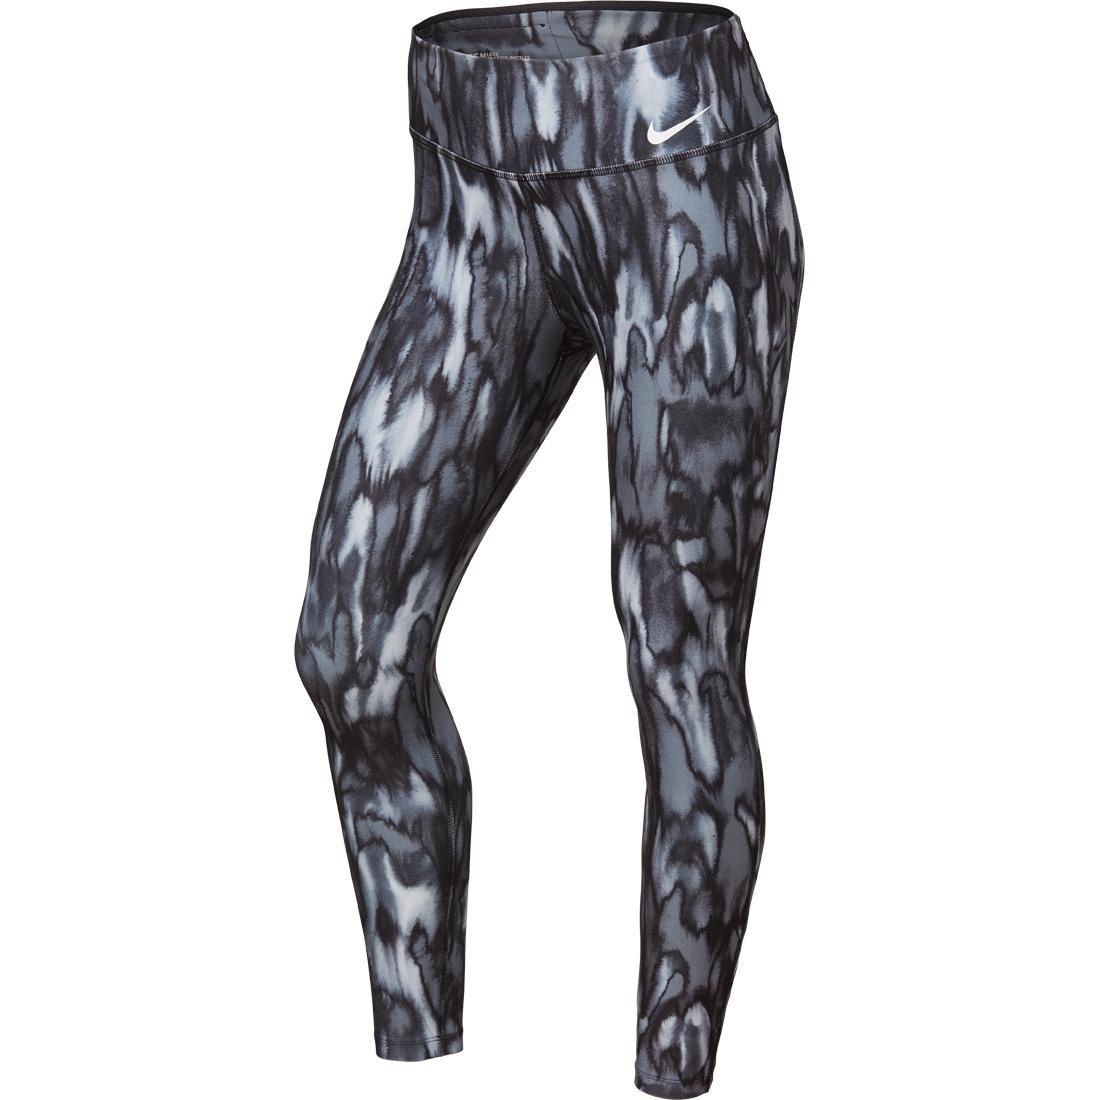 23c1e7946716a Nike Power Legend Long Tights - Women (Printed Black) 833728-010